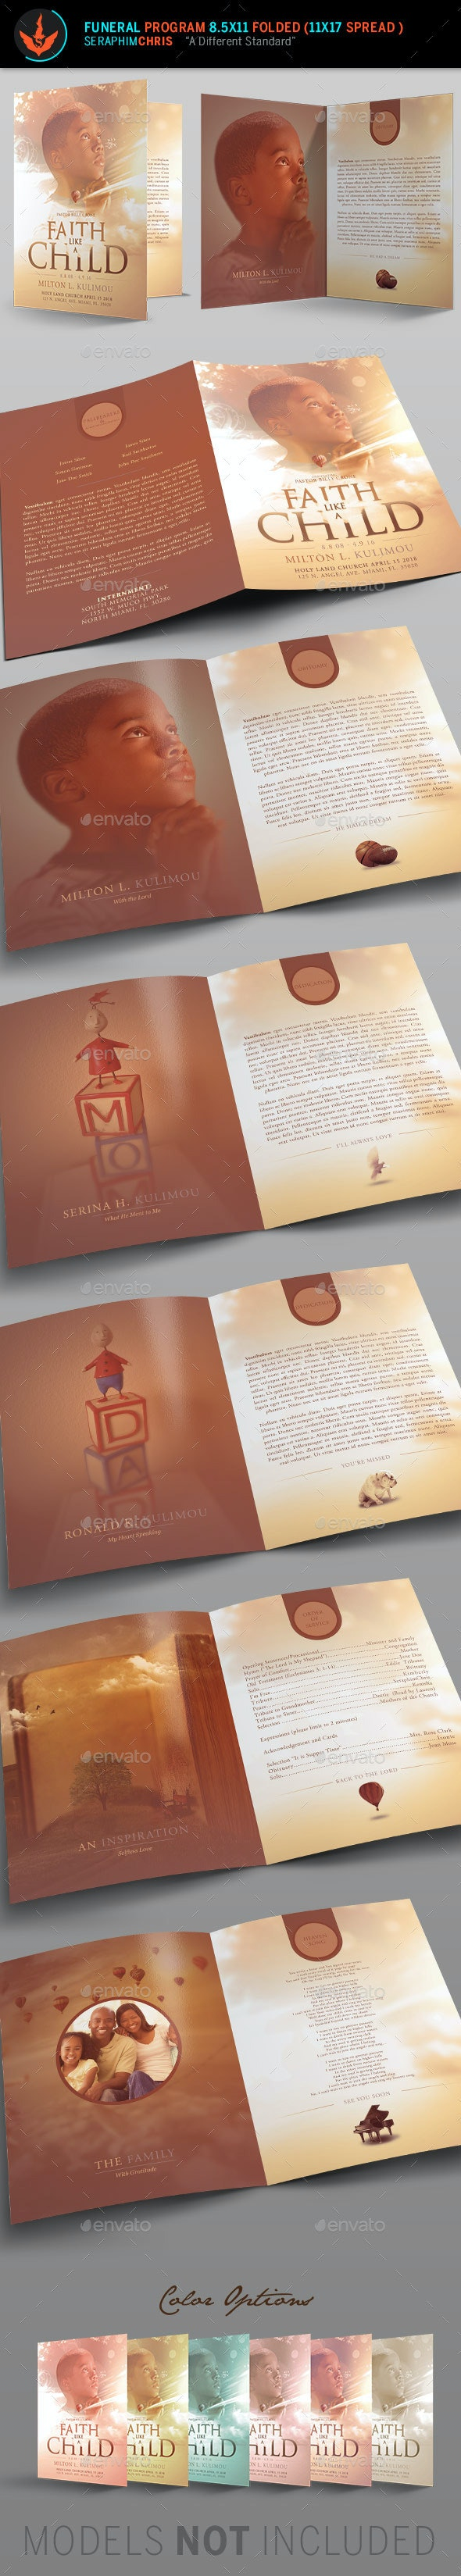 Child Funeral Program Template - Informational Brochures